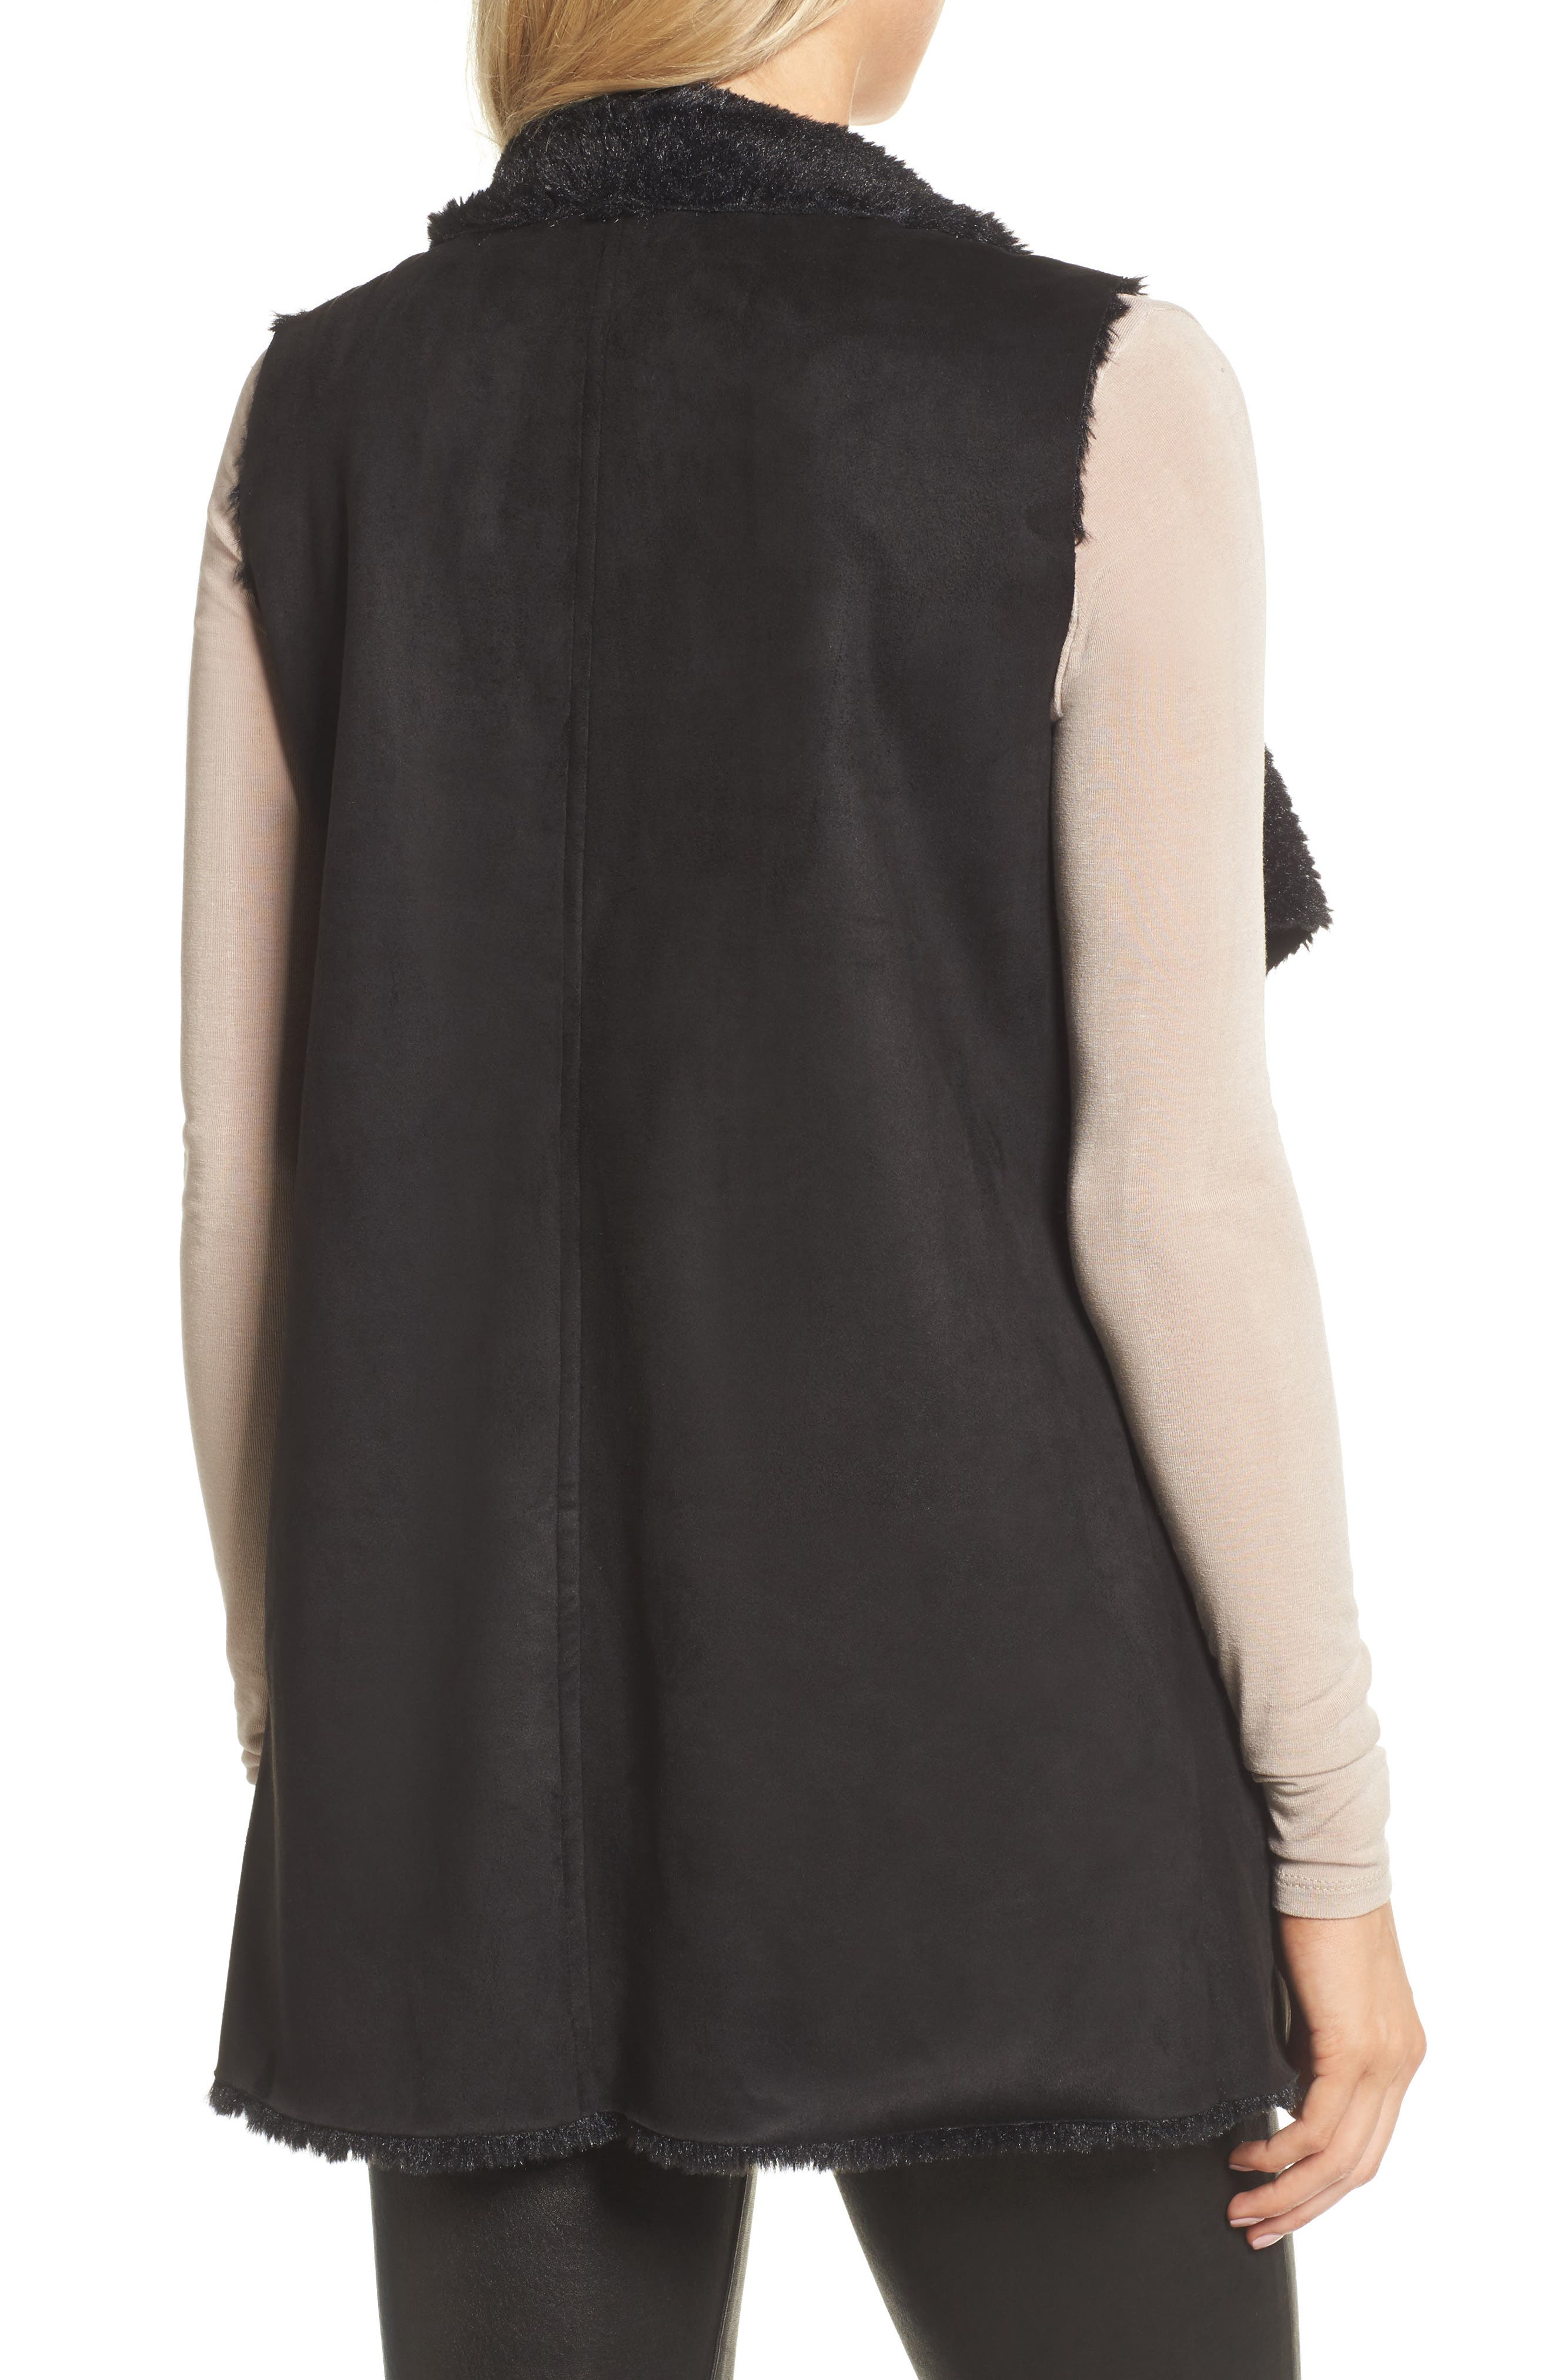 Avalonia Faux Shearling Vest,                             Alternate thumbnail 2, color,                             001